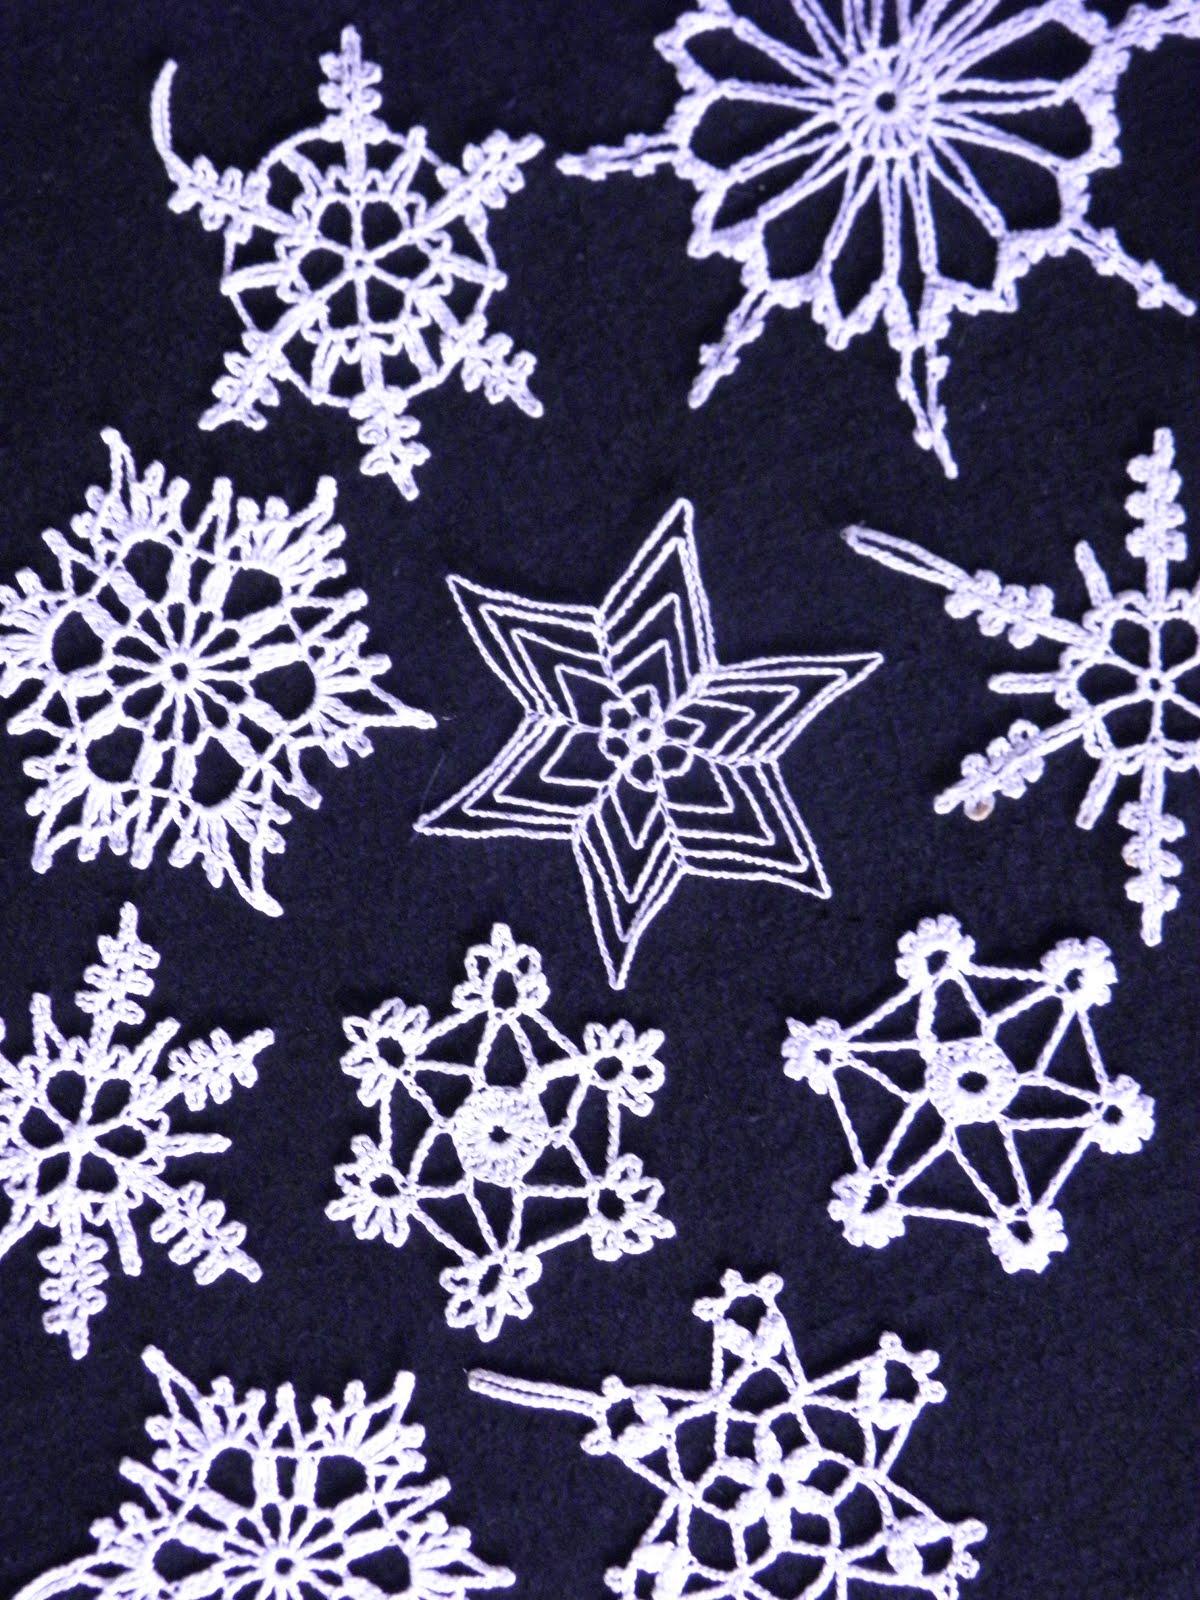 Snowflake Craft